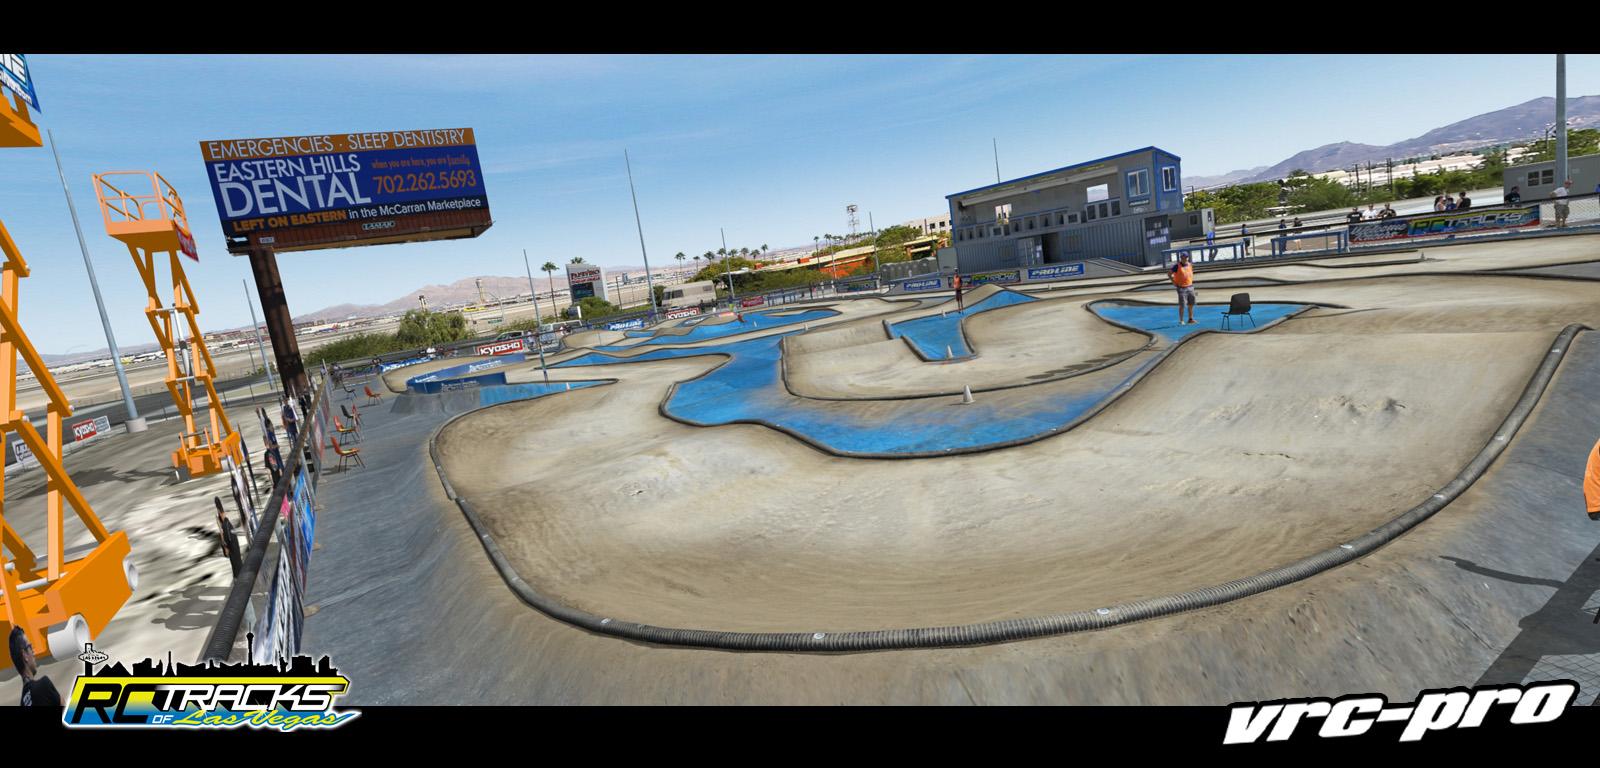 VRC PRO Deluxe Off-road tracks 4 screenshot